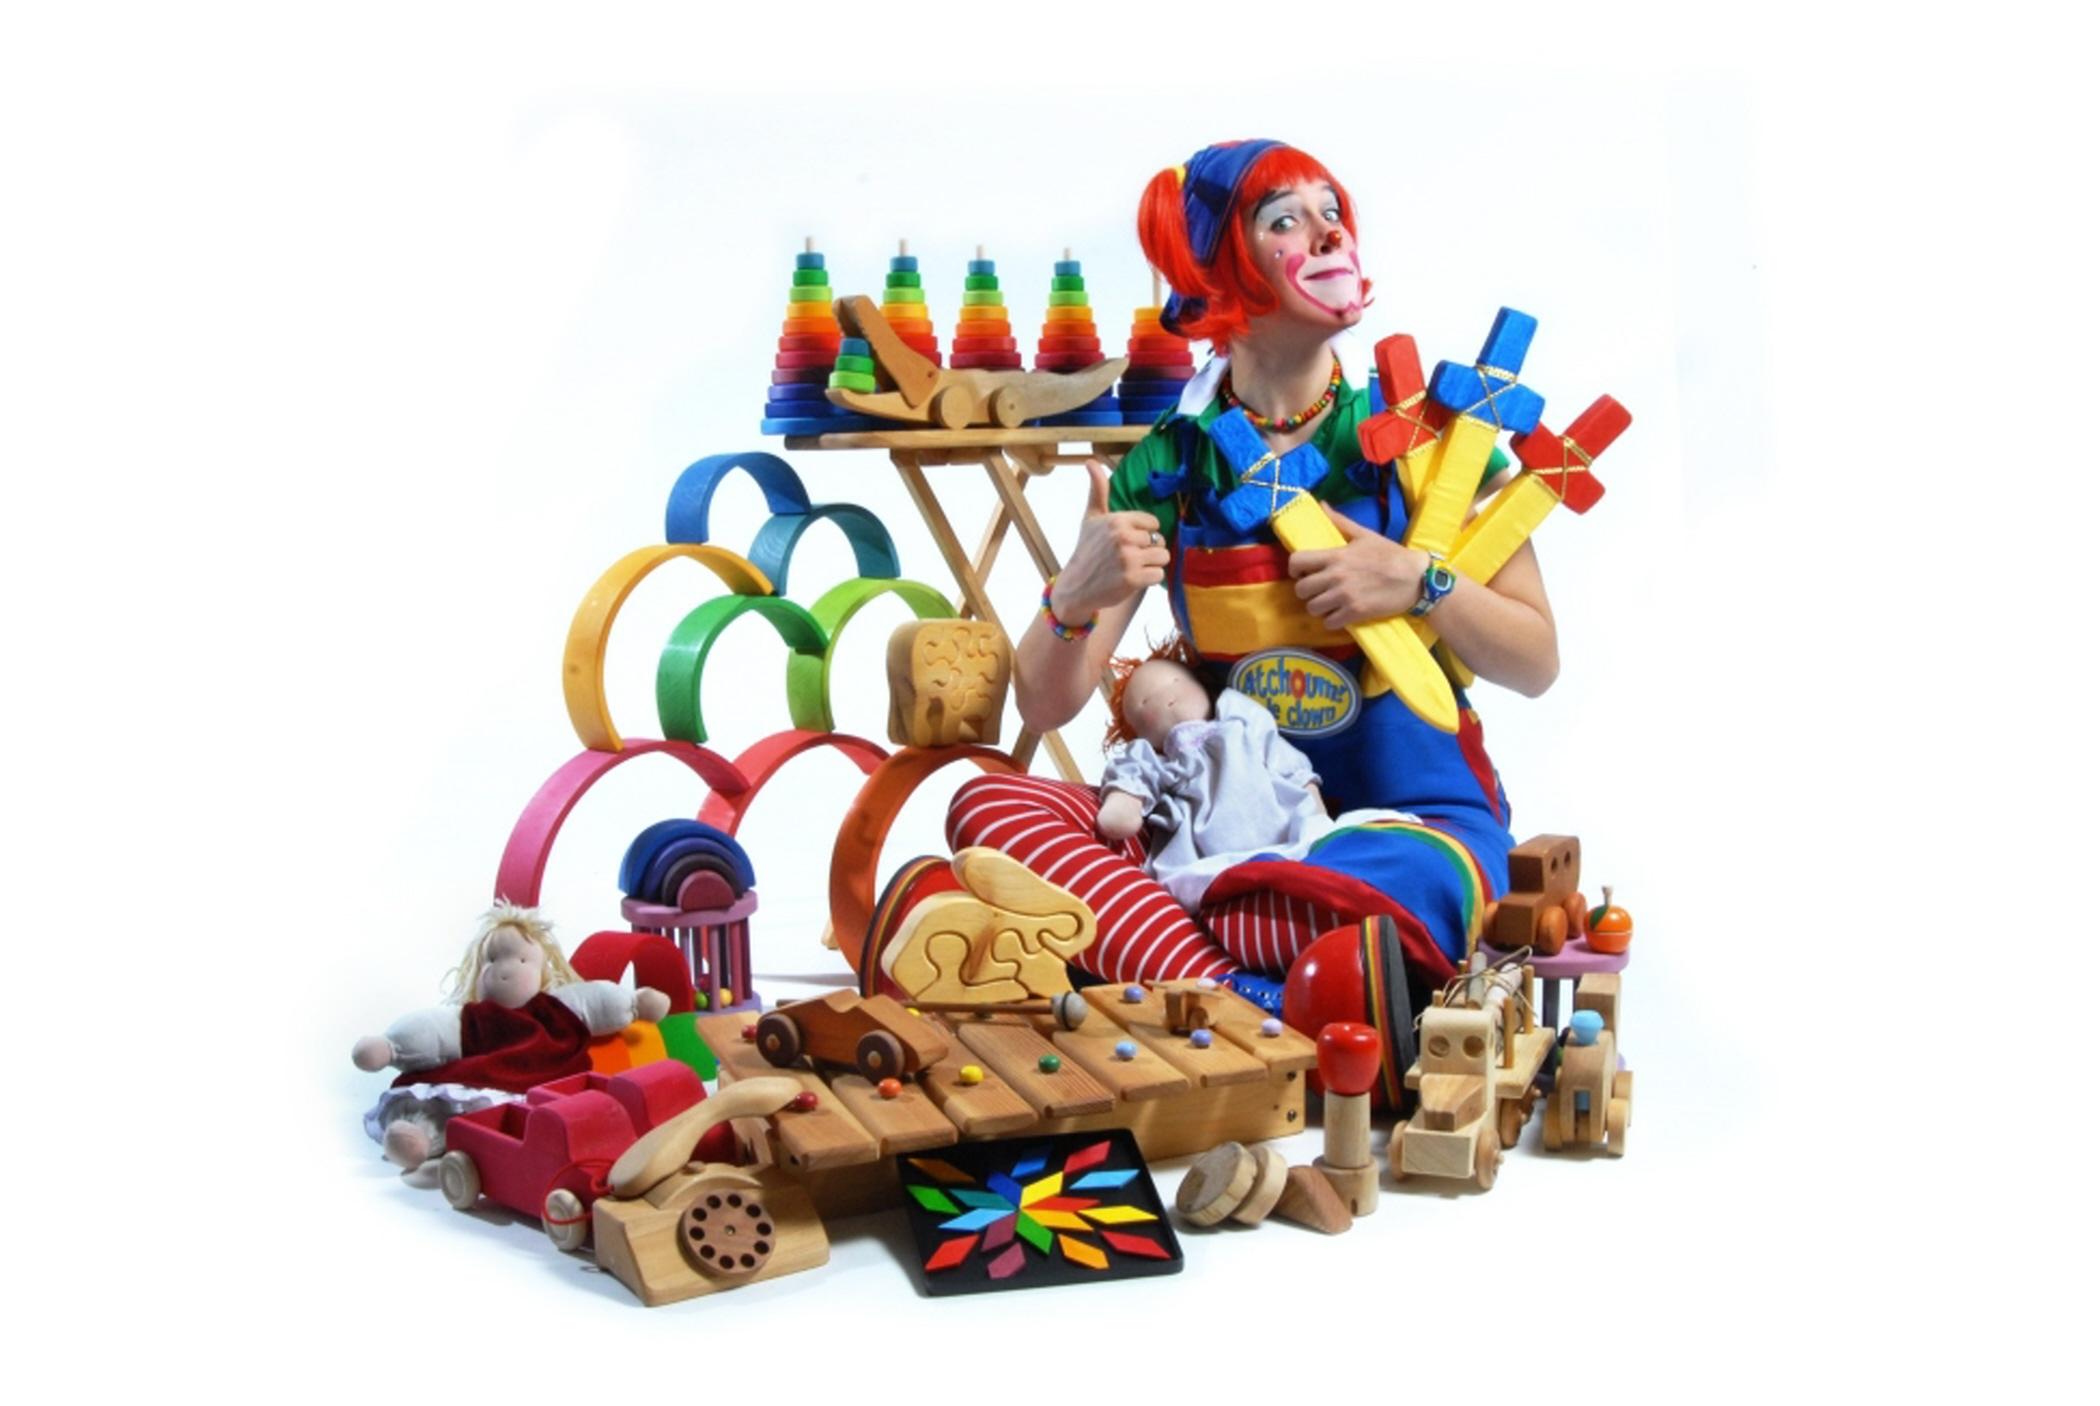 jouetsnaturelsversionmoyenne5x7.jpg